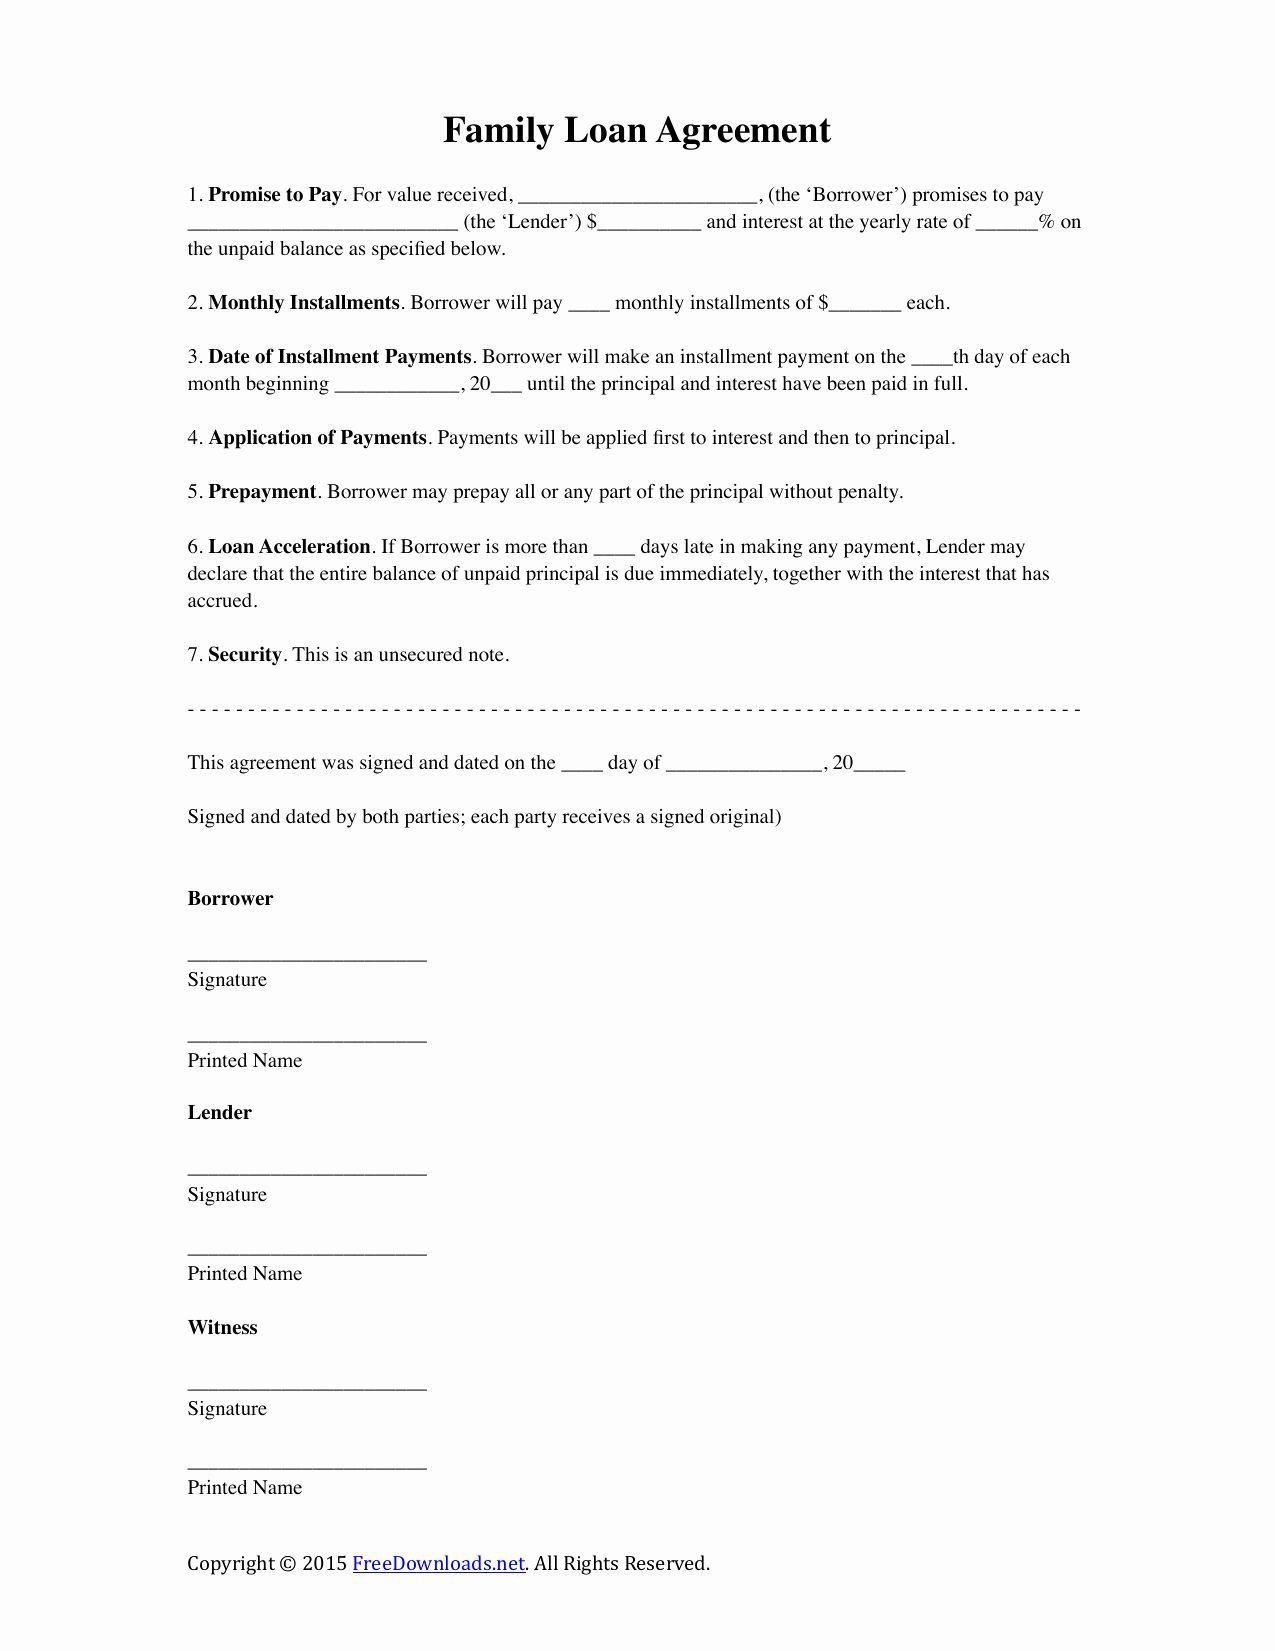 000 Frightening Family Loan Agreement Template Pdf Uk Image Full